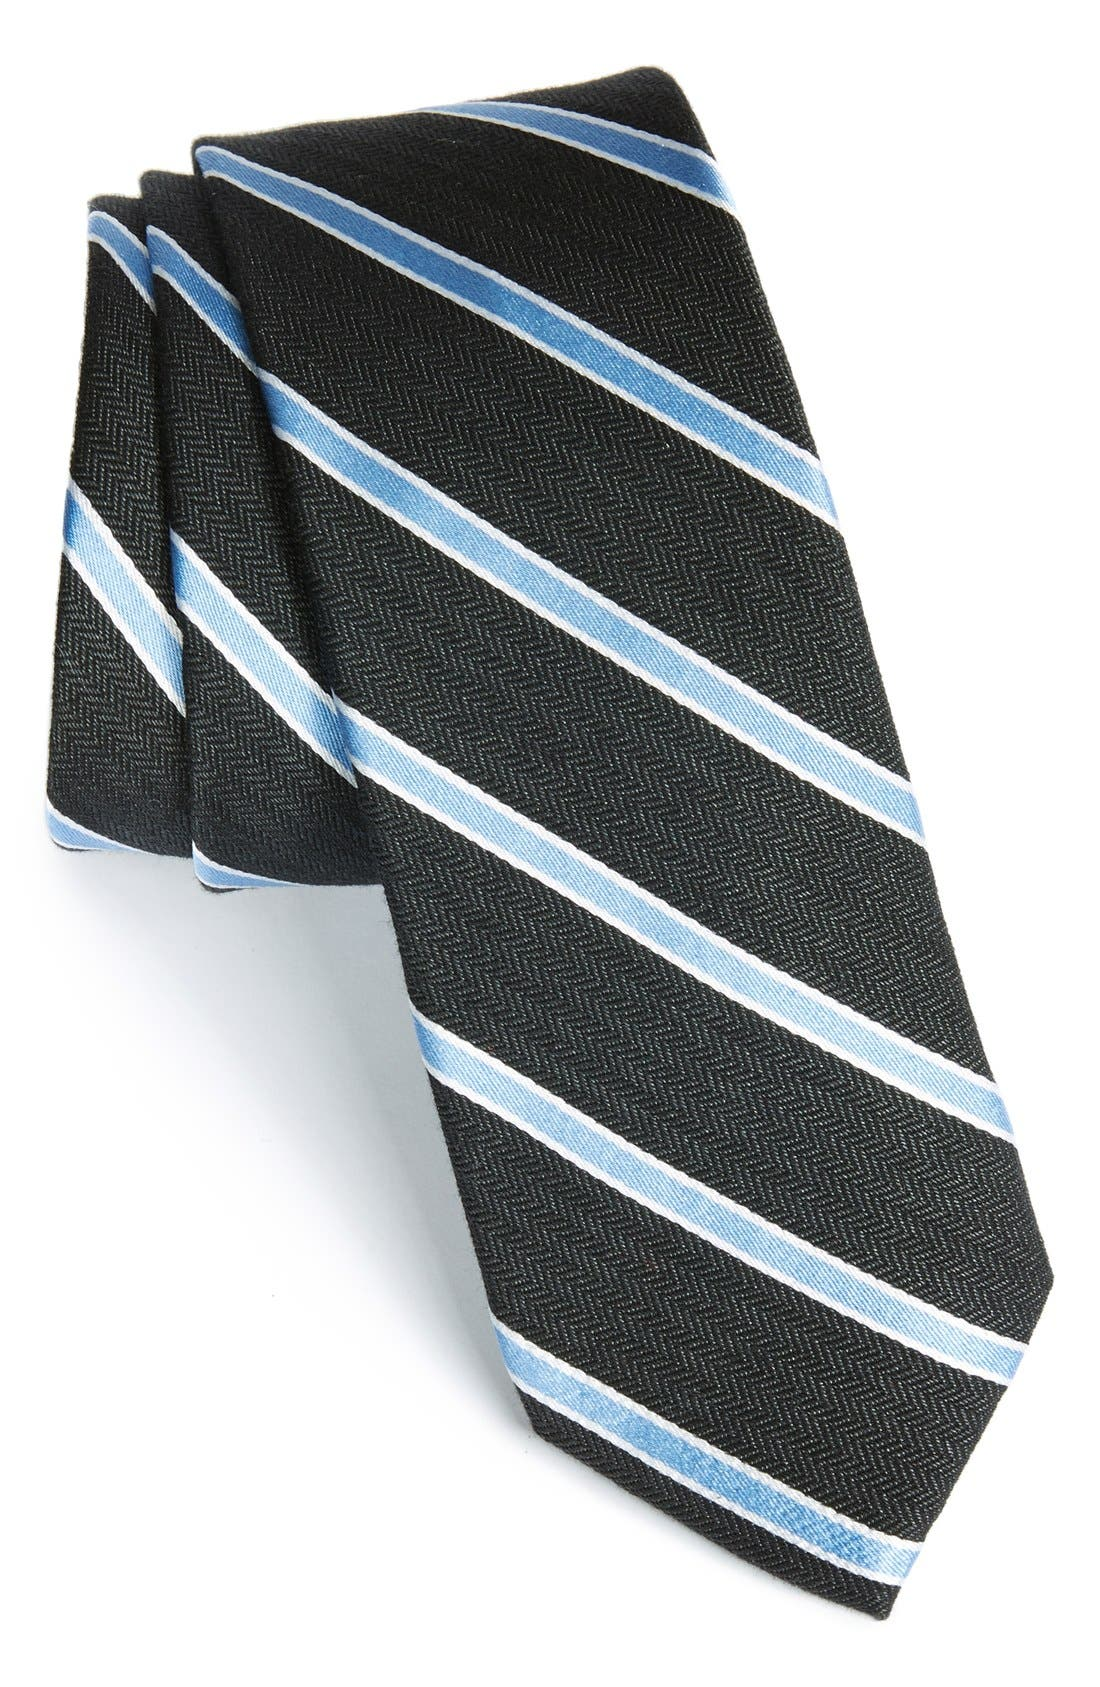 Main Image - 1901 'Smoak' Stripe Woven Silk & Cotton Tie